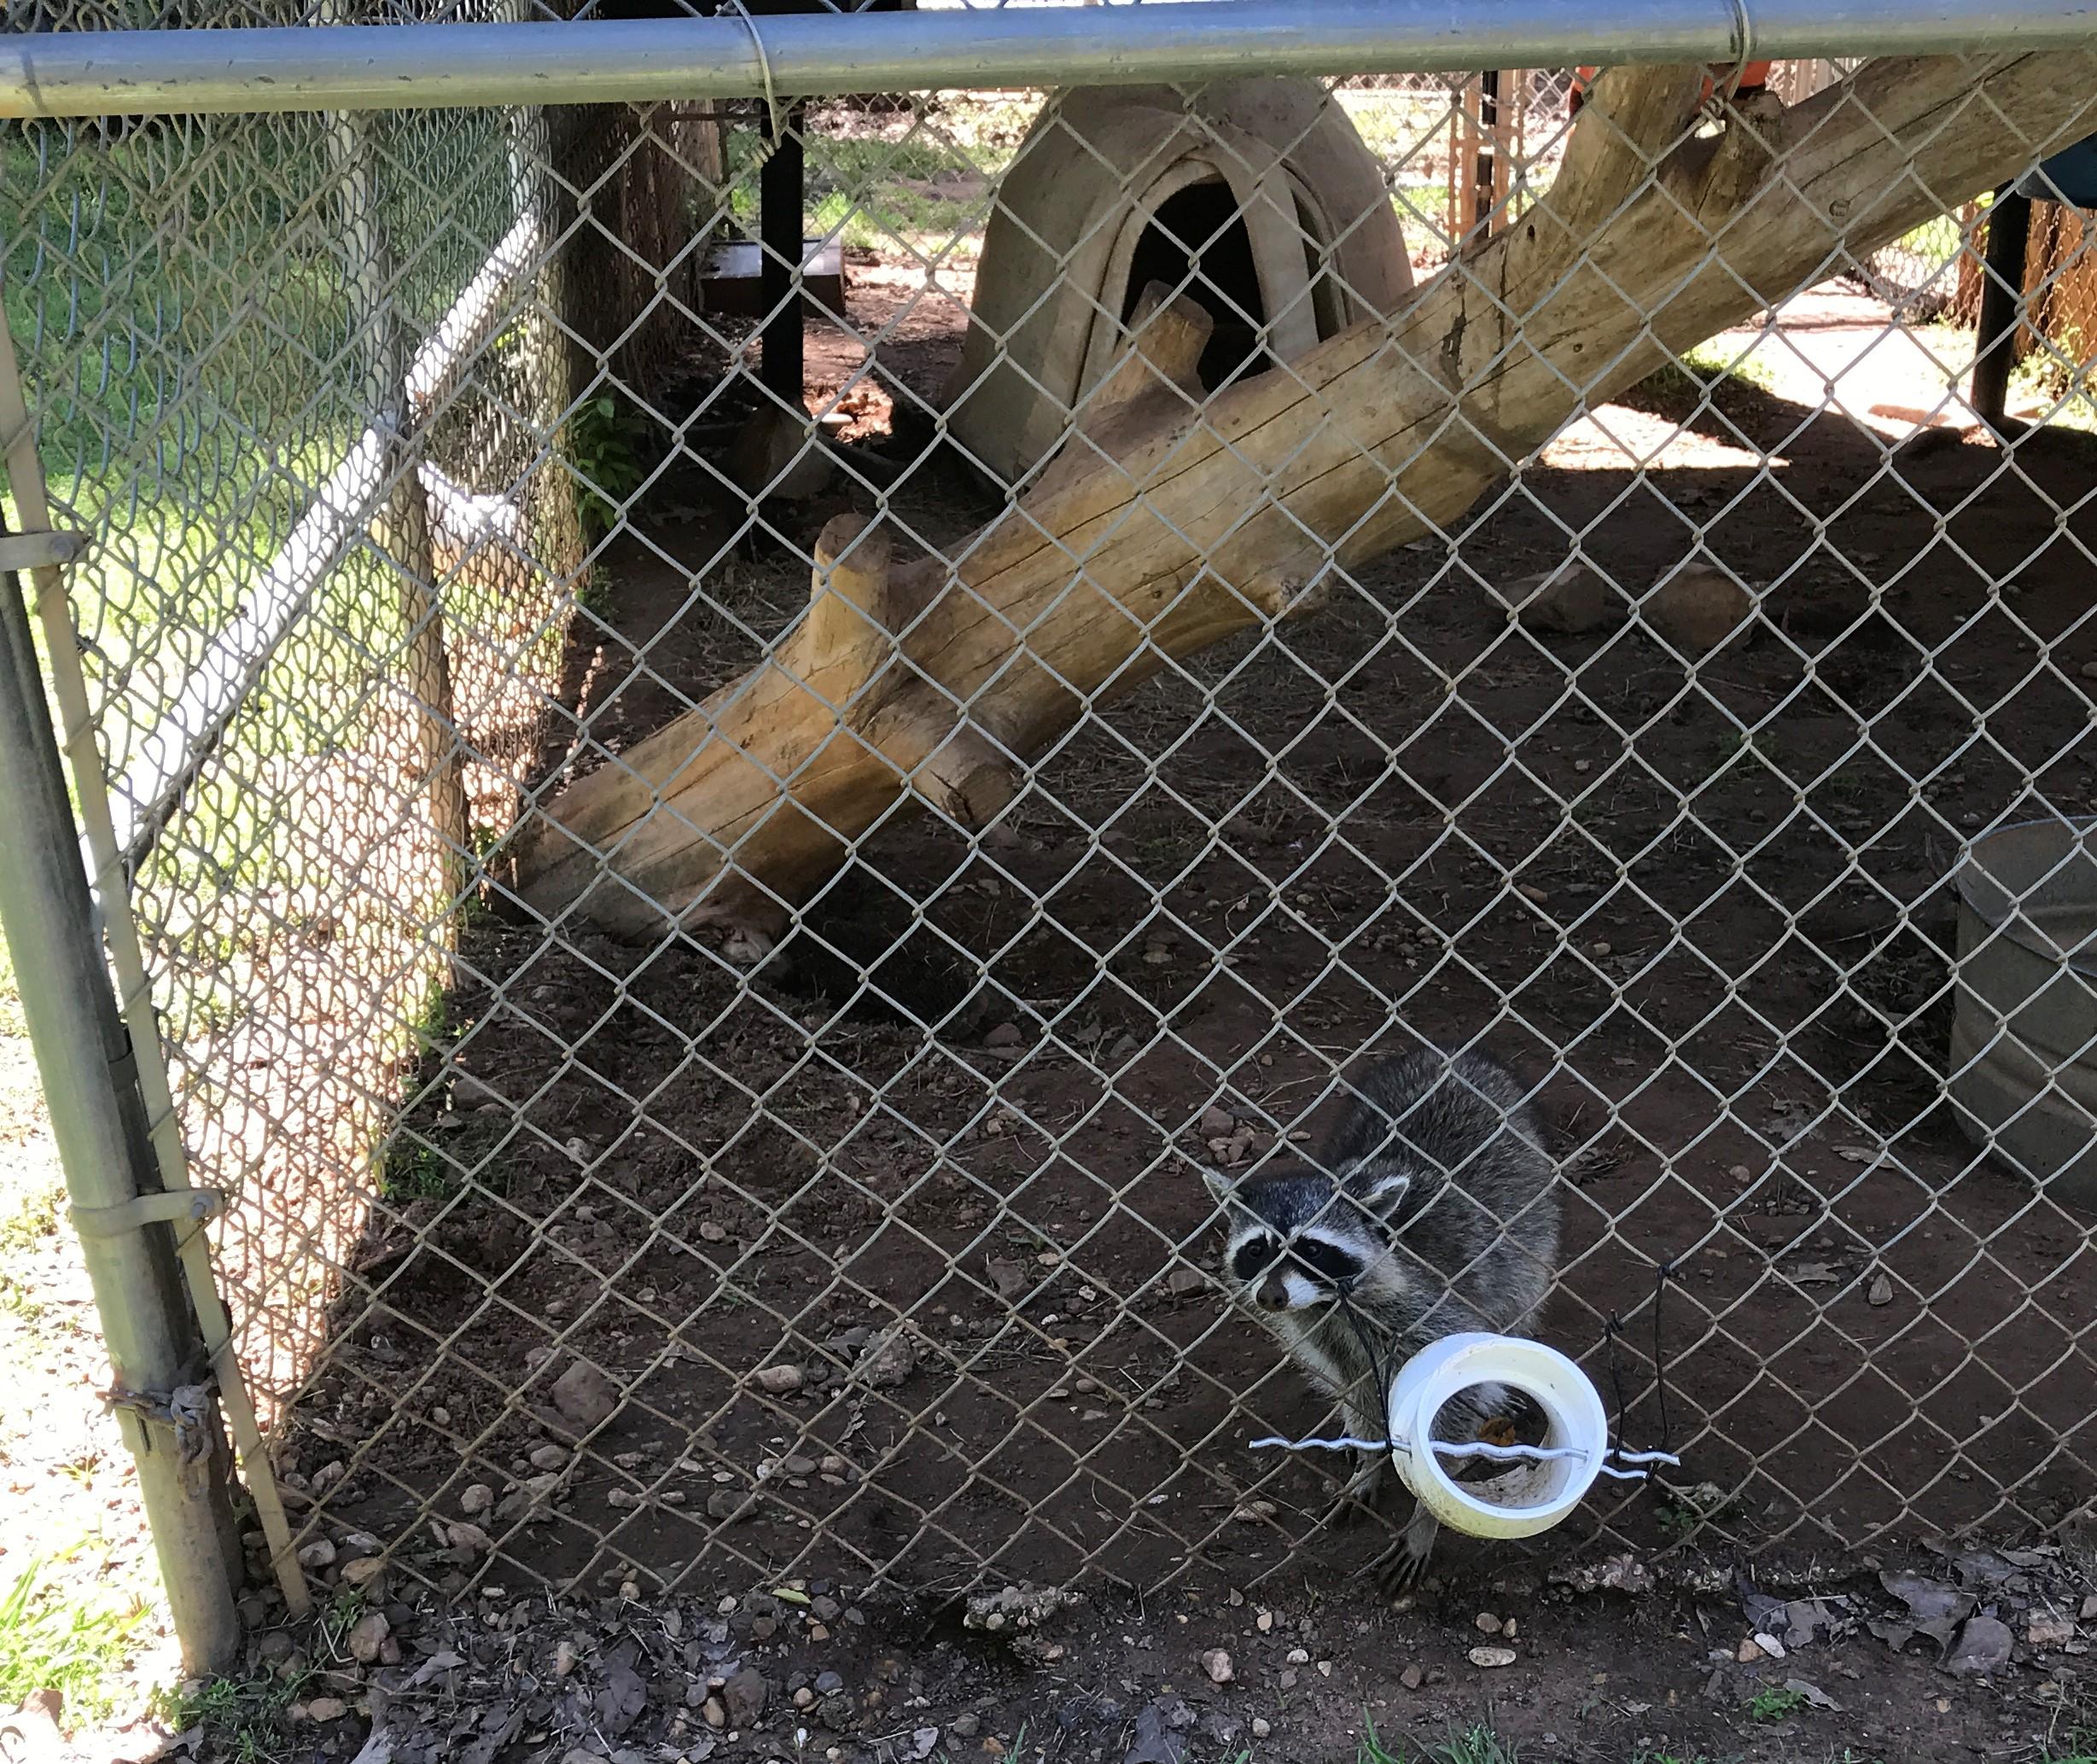 The raccoons they had.. aka trash pandas!